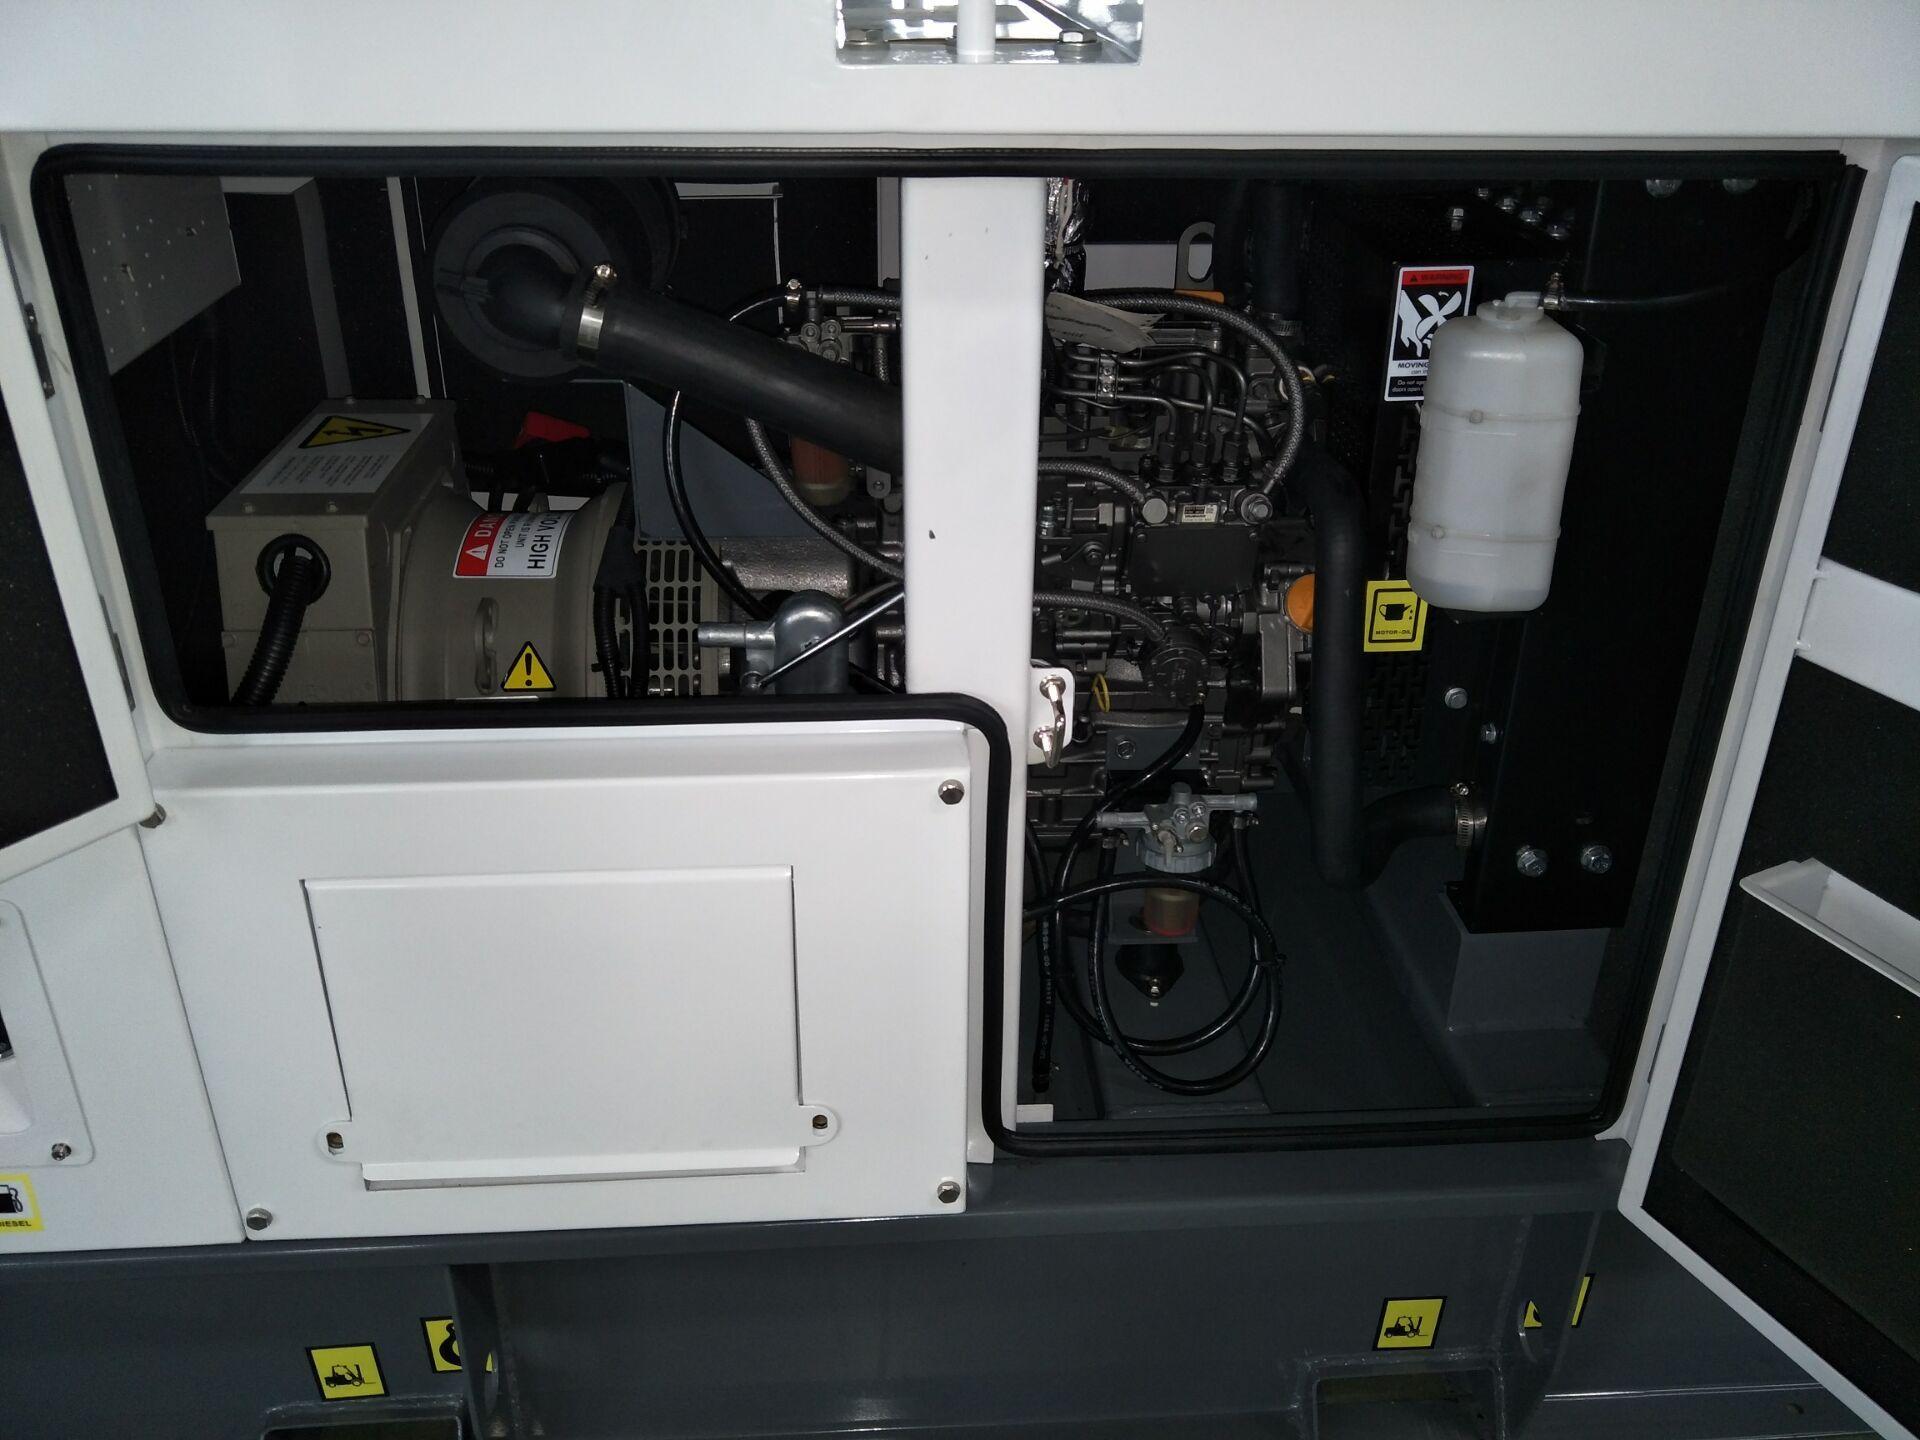 Yanmar generator set 13kva/10kw,with engine model 3TNV88-GGE, 50hz/60hz, silent